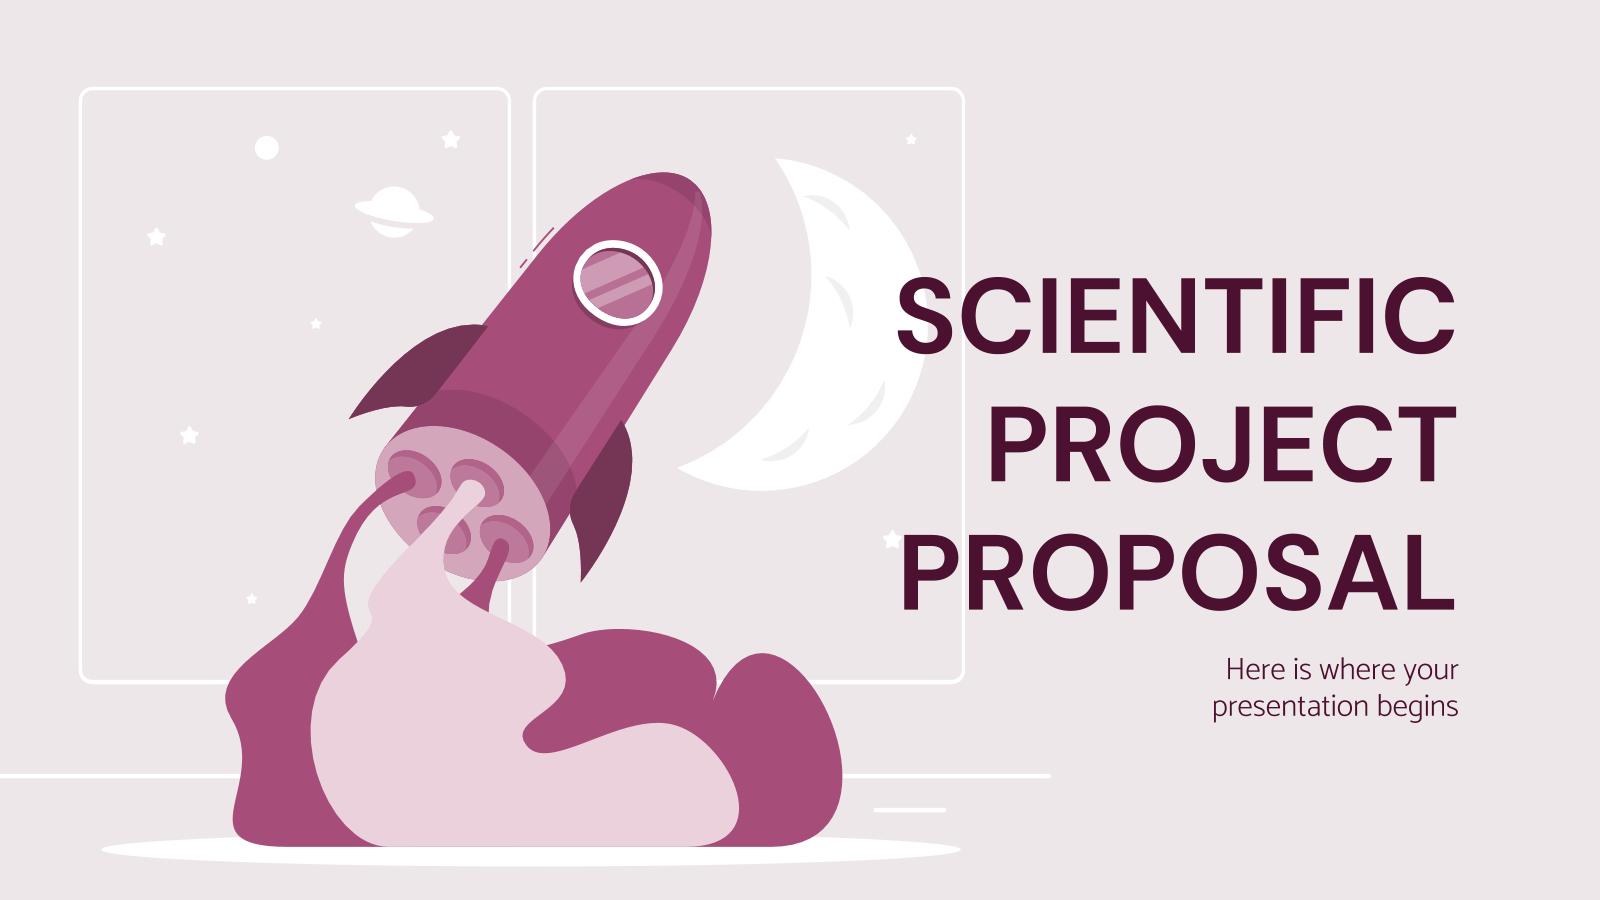 Scientific Project Proposal presentation template